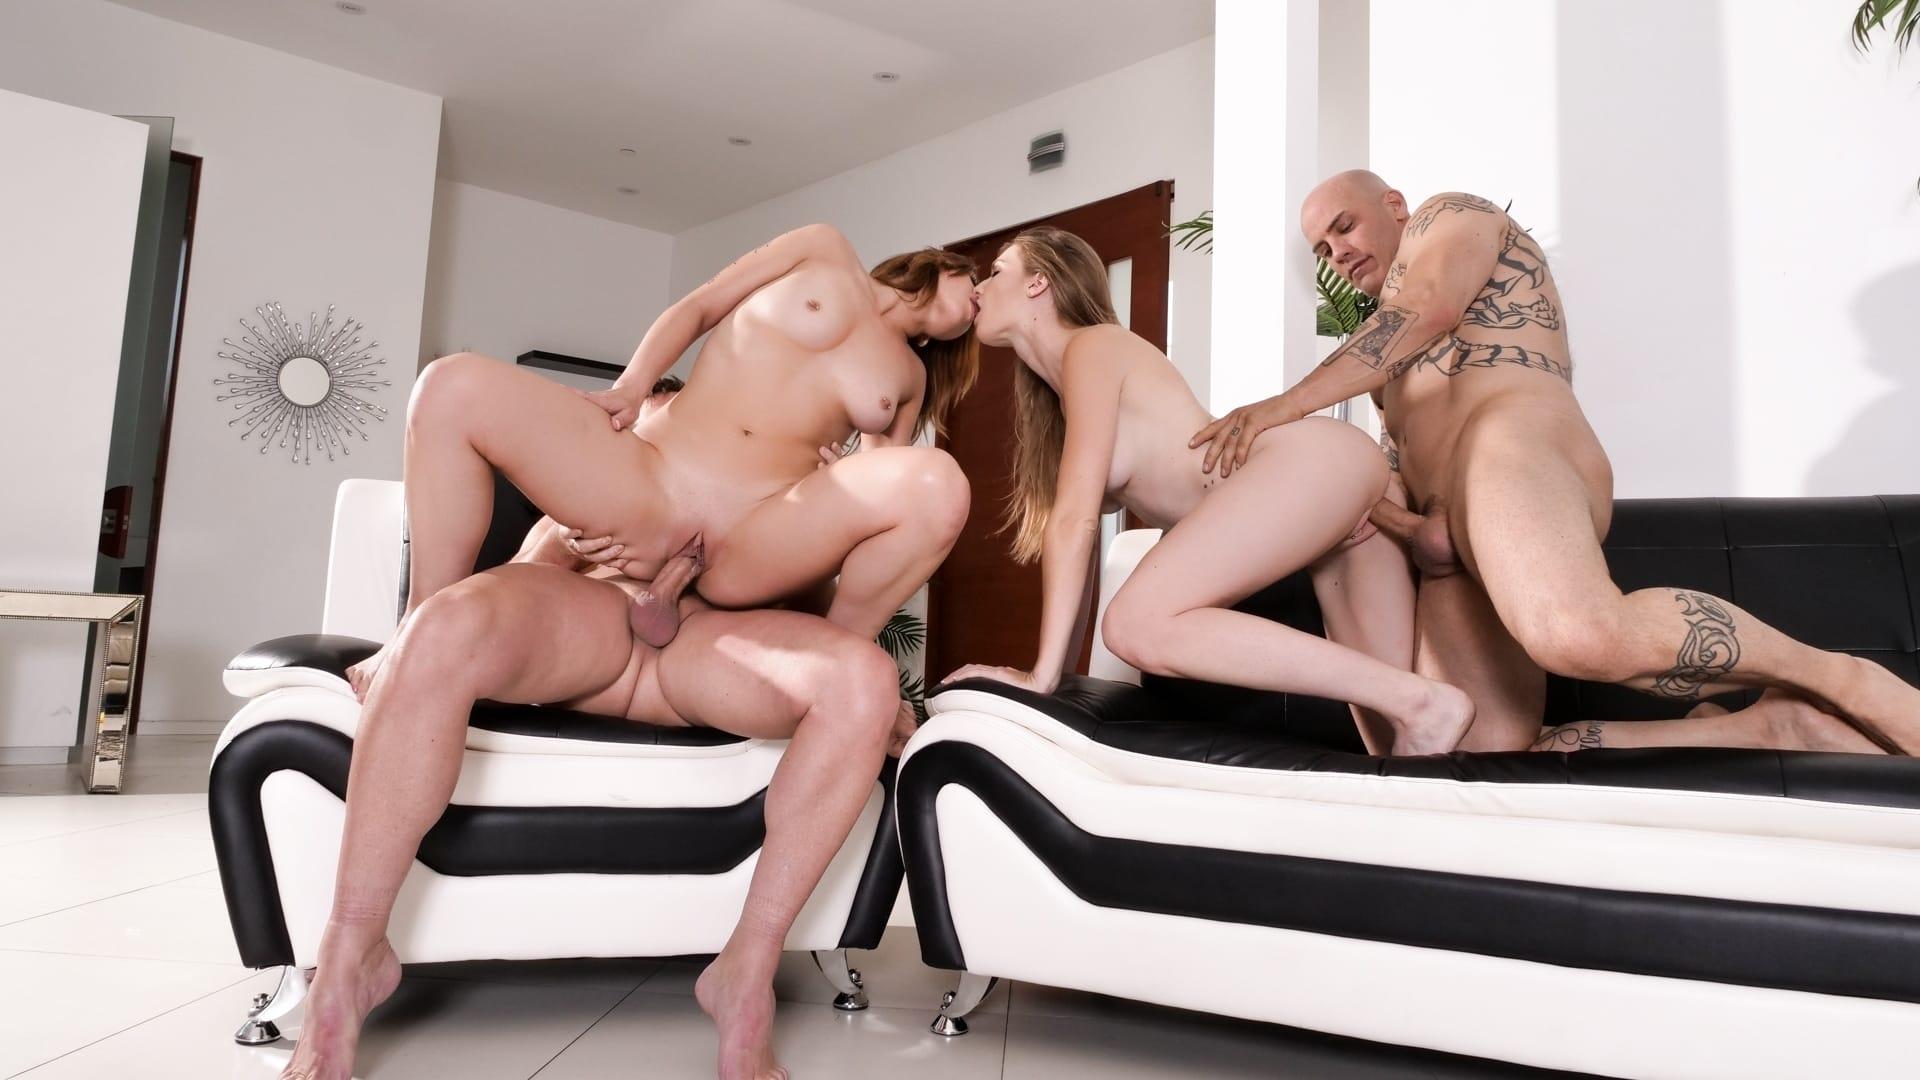 Mom johnson city tn swingers porn female